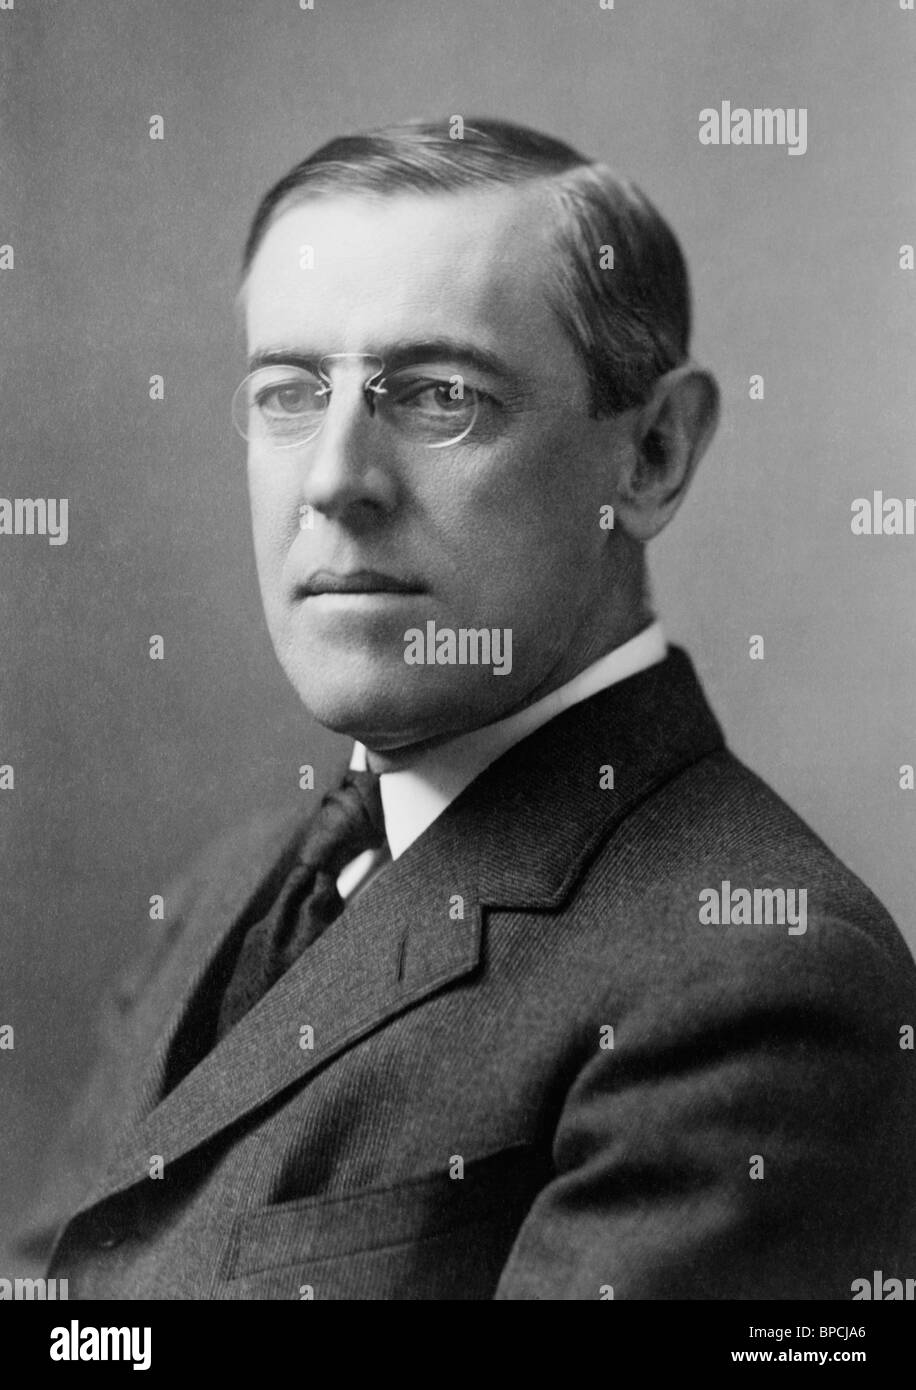 Portrait photo circa 1908 of Woodrow Wilson (1856 - 1924) - the 28th US President (1913 - 1921). - Stock Image